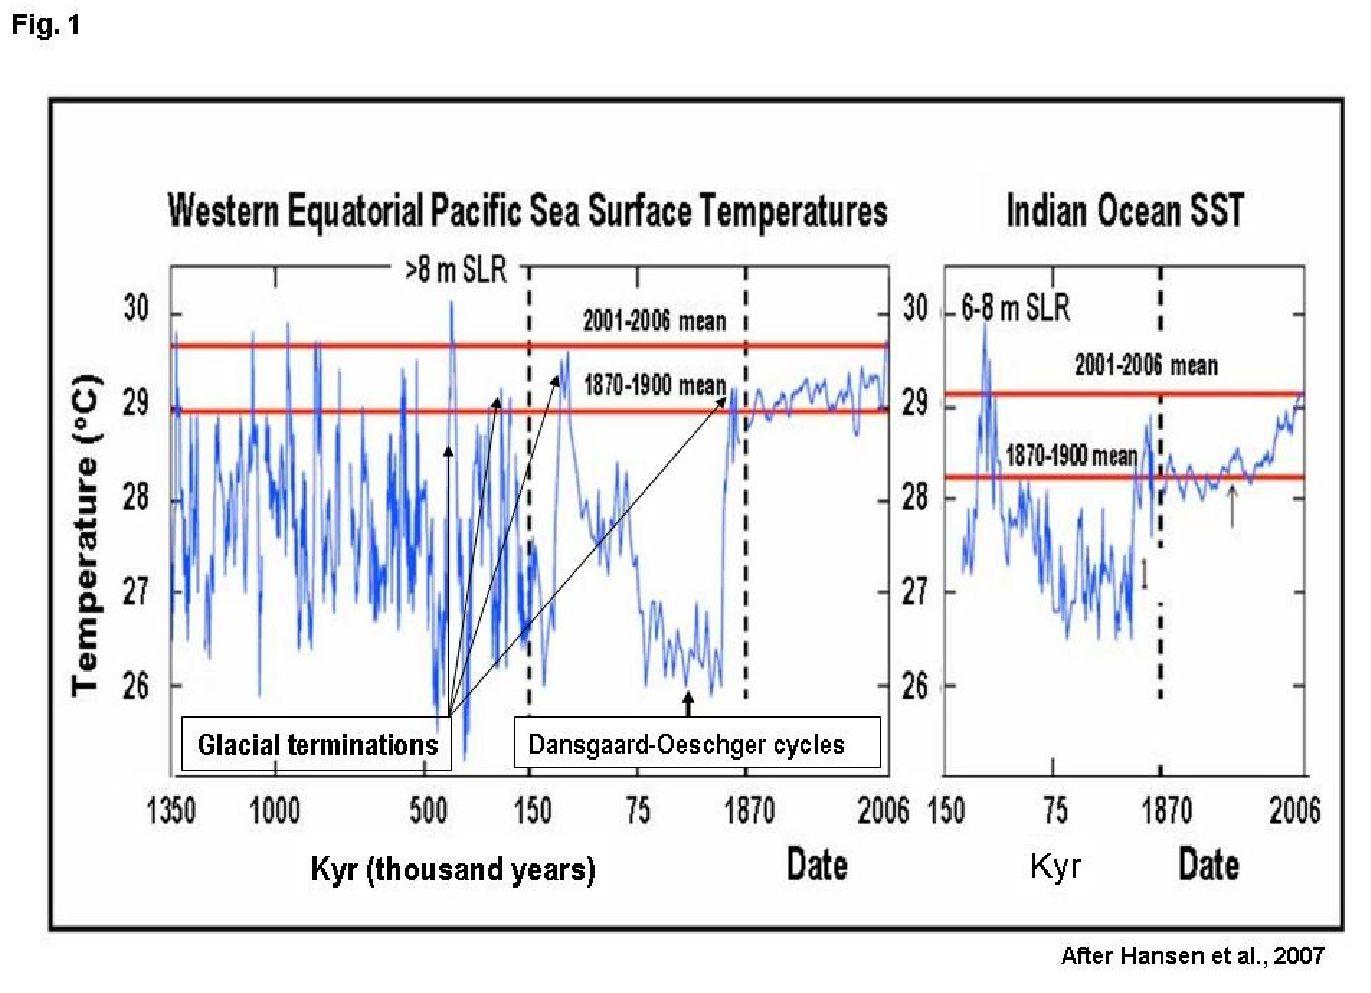 Figure 1. Evolution of deep-sea temperatures in the Pacific and Indian oceans (Hansen et al., 2007)